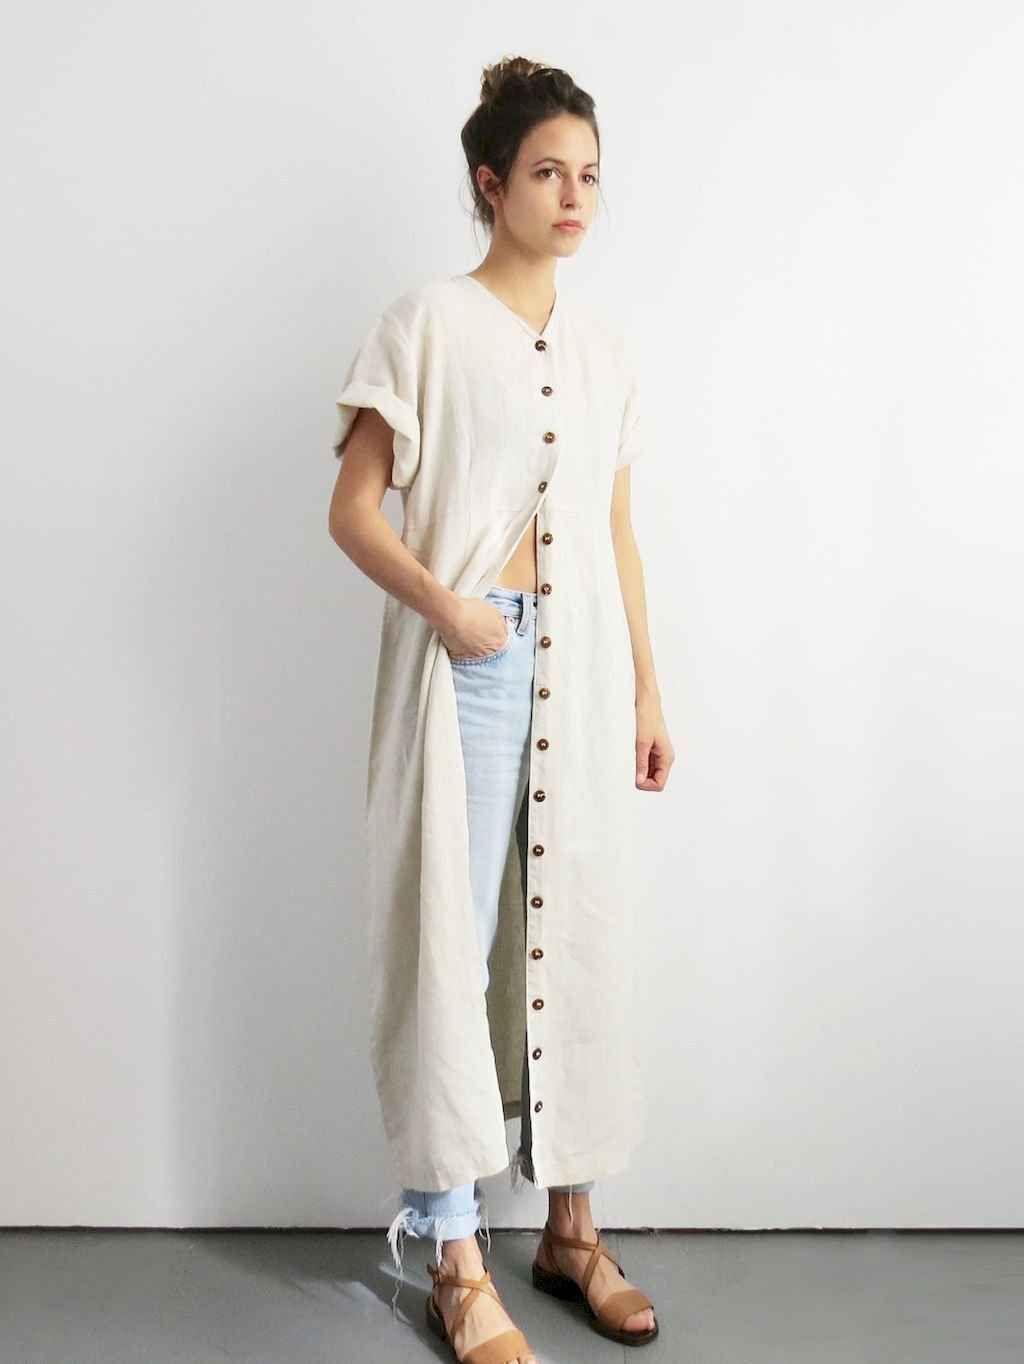 Pin by Diya Bhopani on dresses   Minimalist dresses, Preppy